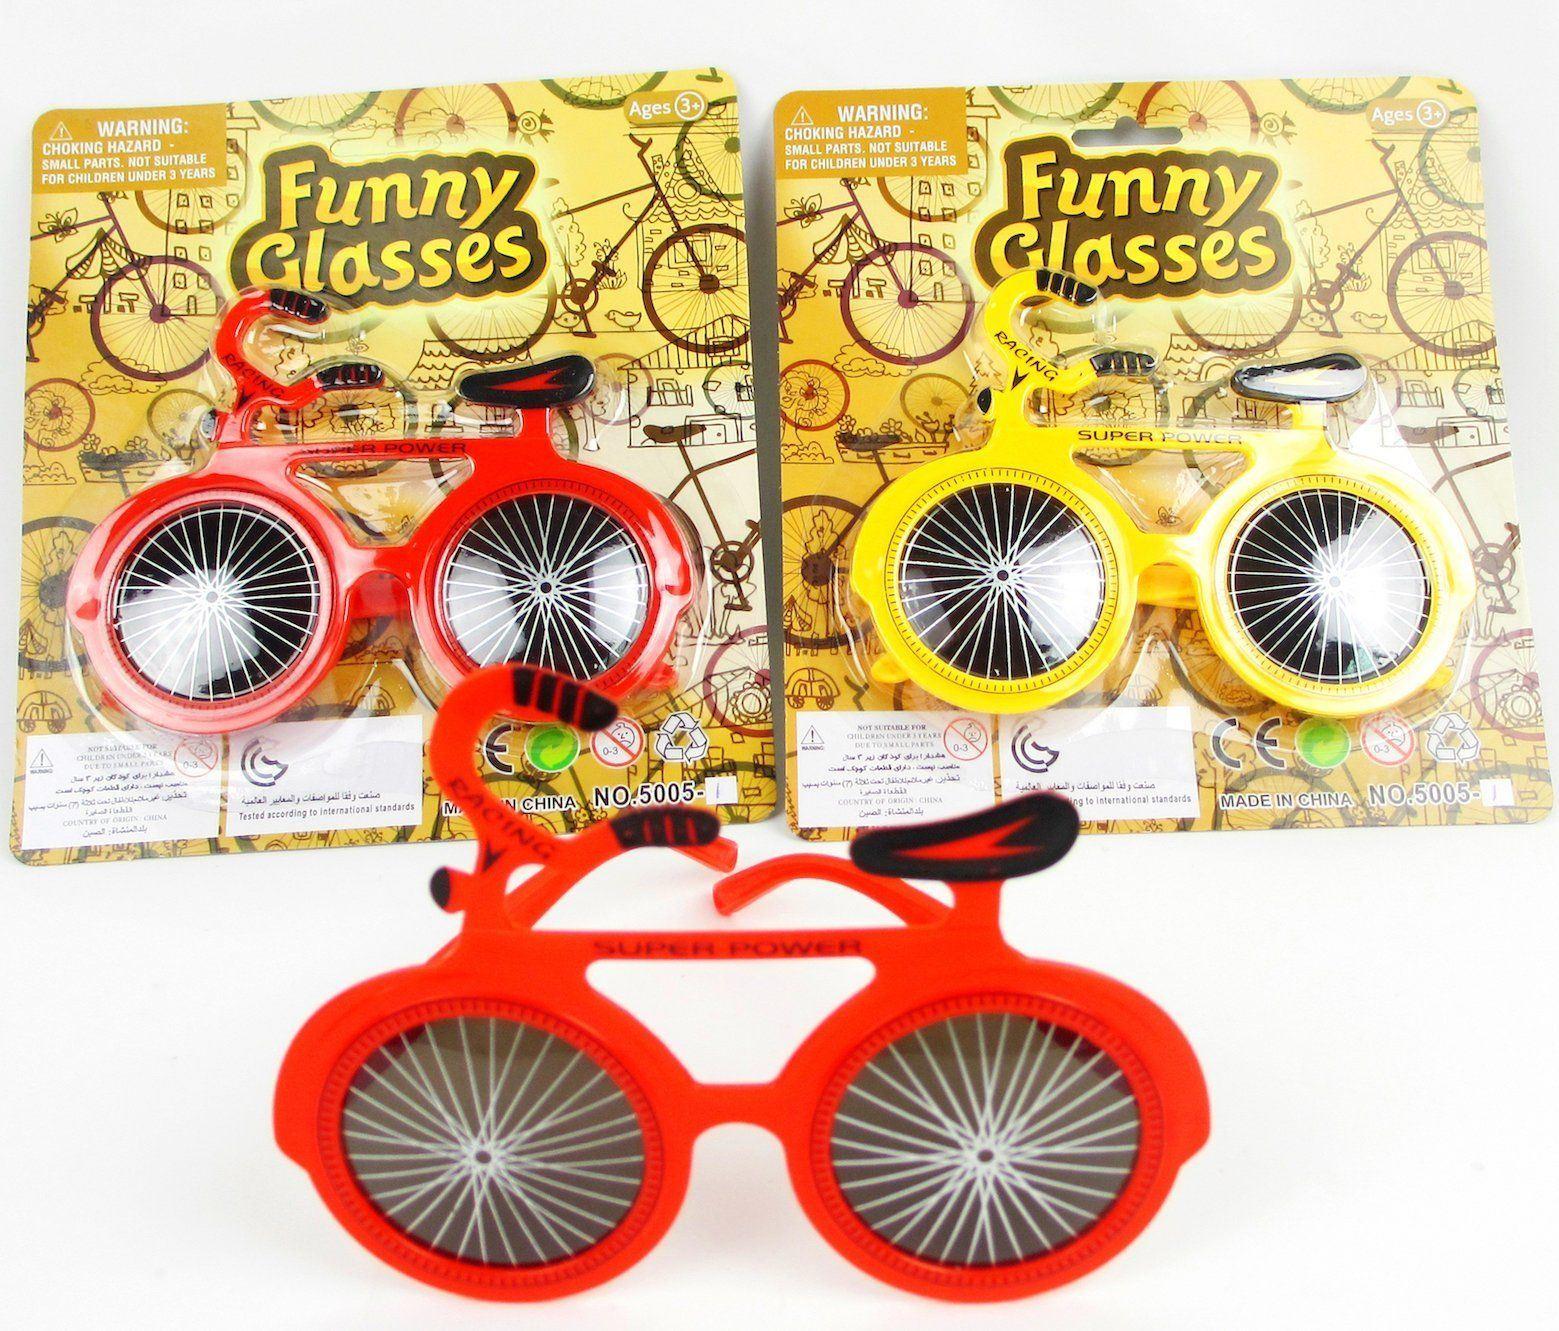 thumbnail 40 - Glasses Joke Sunglasses Fancy Dress Costume Party Fun Photo Booth Prop 1-12Pcs